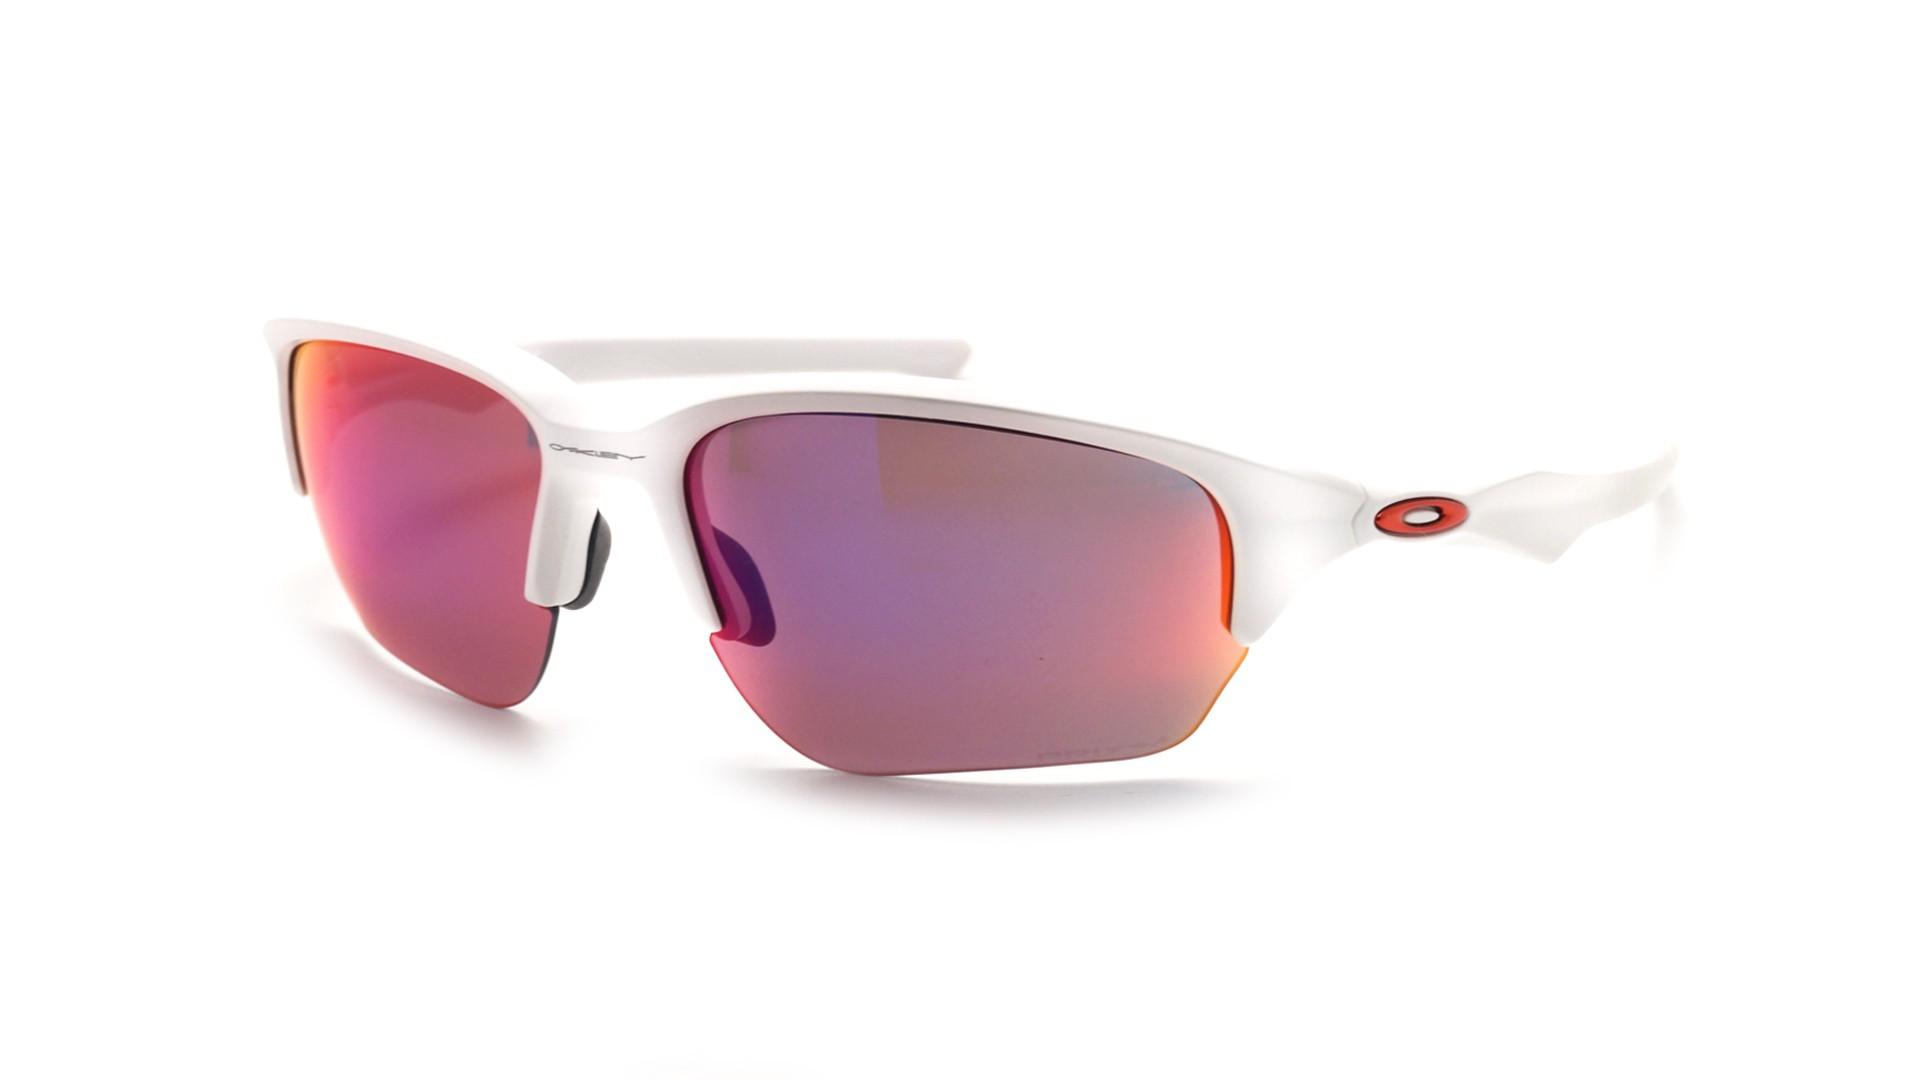 c24d5d28a88 Sunglasses Oakley Flak Beta White Prizm OO9363 05 64-8 Large Flash